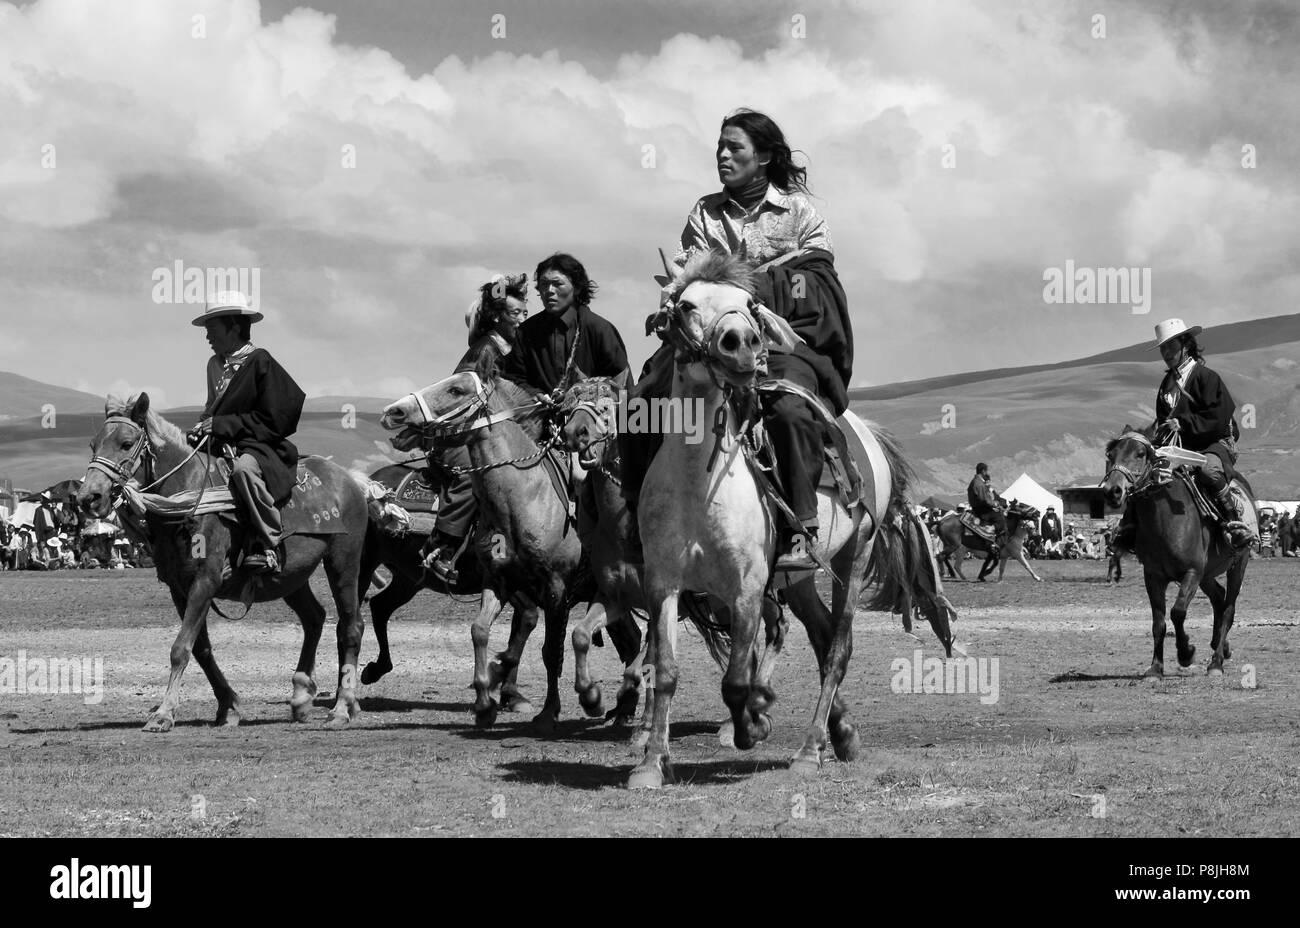 Khampas, the warrior horseman of old Tibet,  compete at the Litang Horse Festival - Kham, Sichuan Province, China, (Tibet) - Stock Image